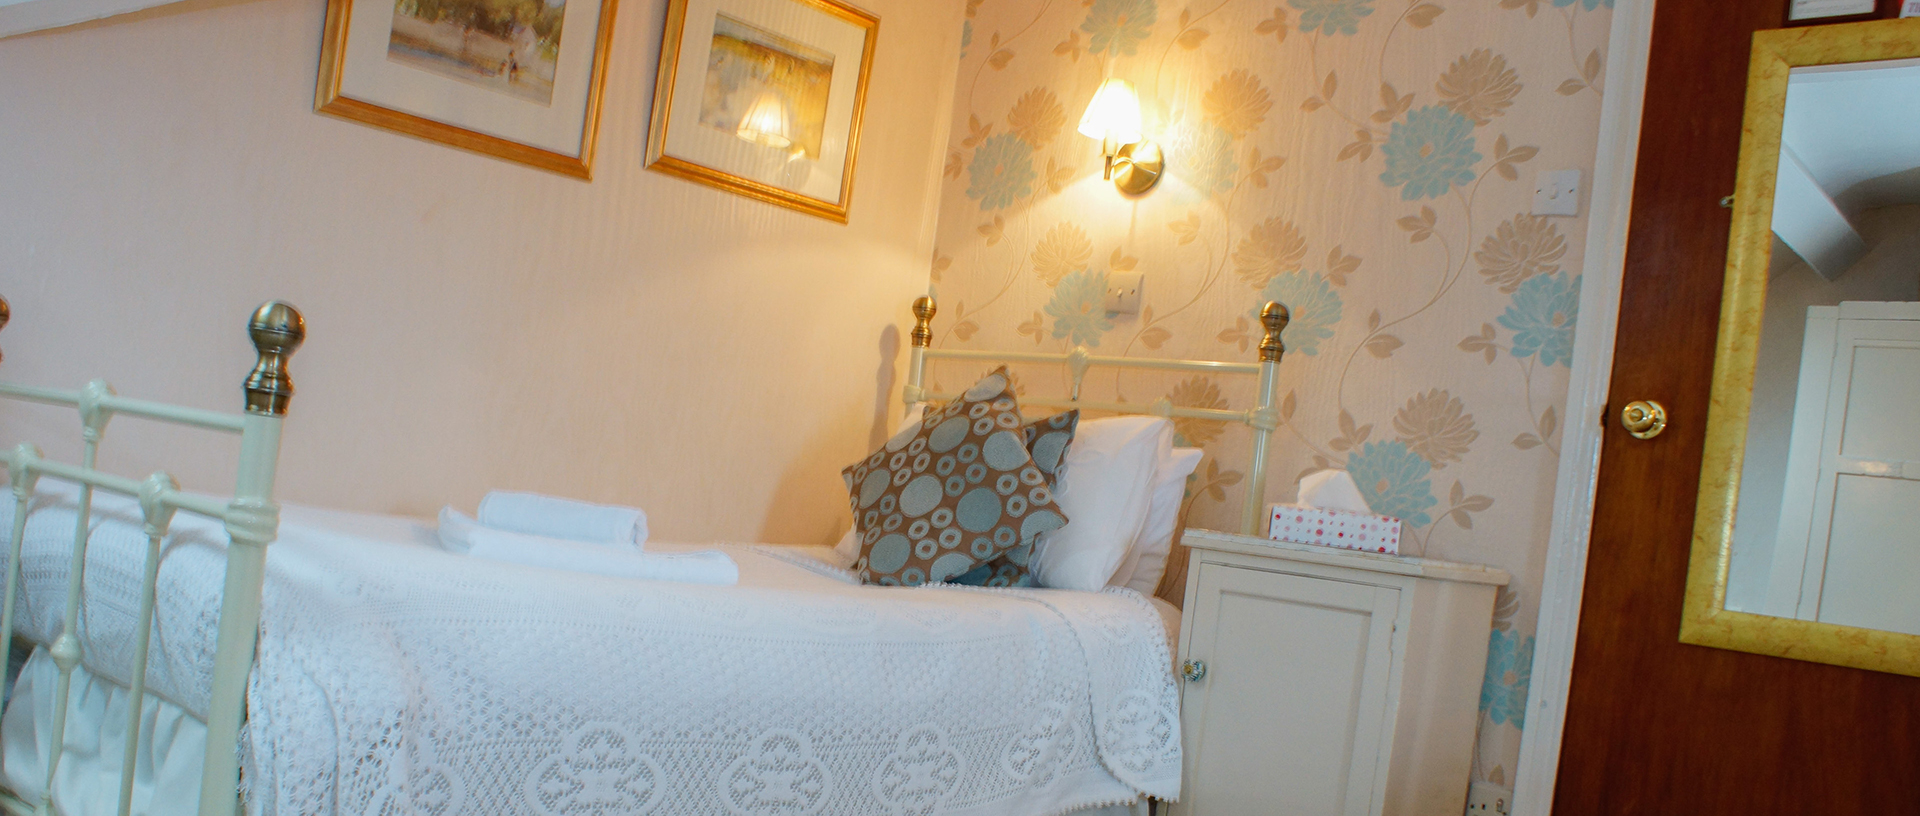 Room 8 the Castlebank Hotel, Conwy, North Wales